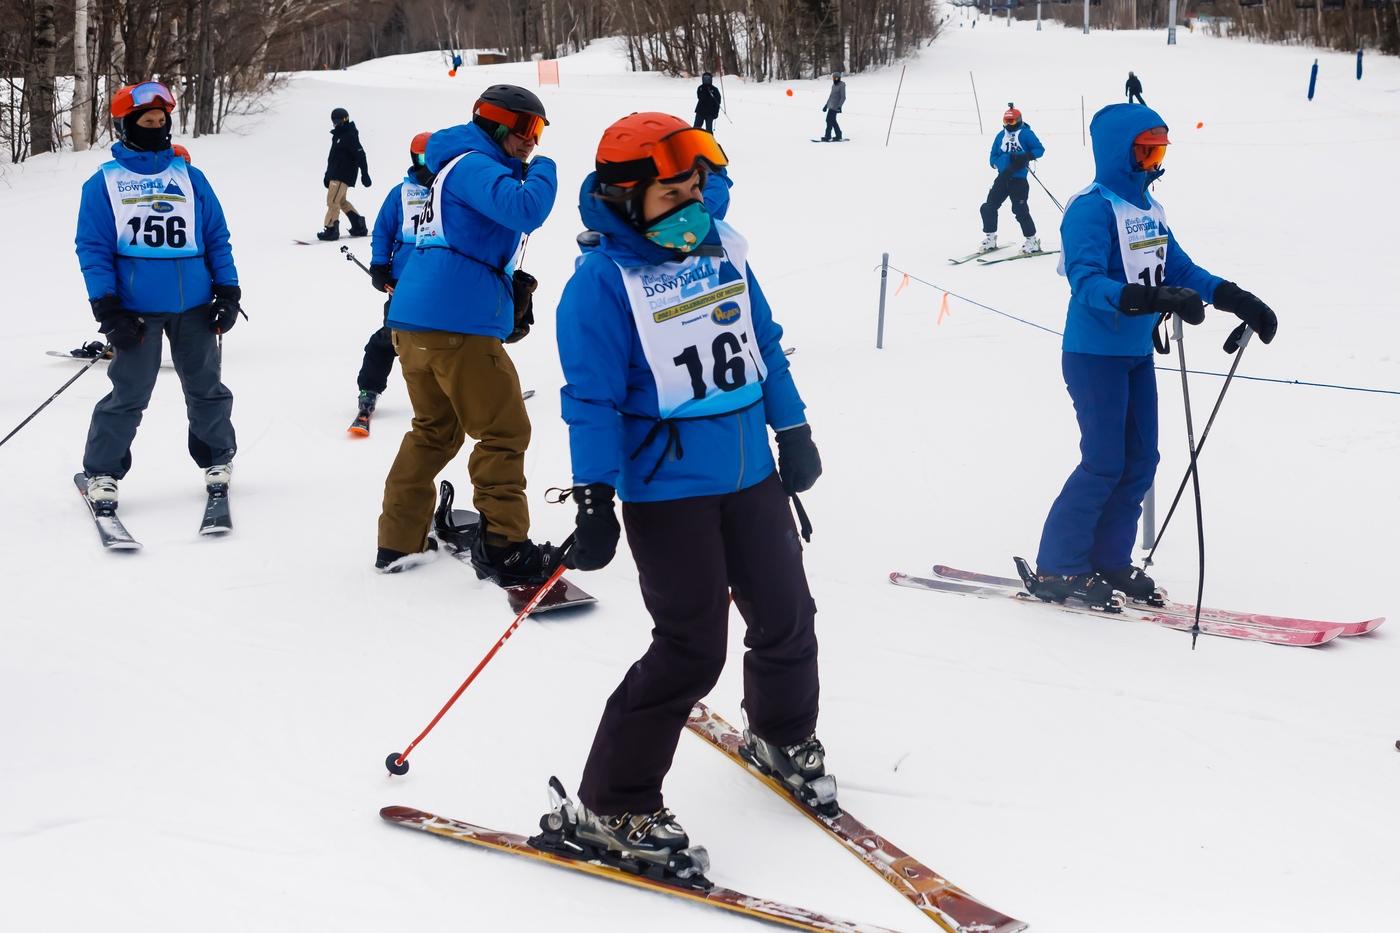 WinterKids Downhill 24 2021 SDP 2890